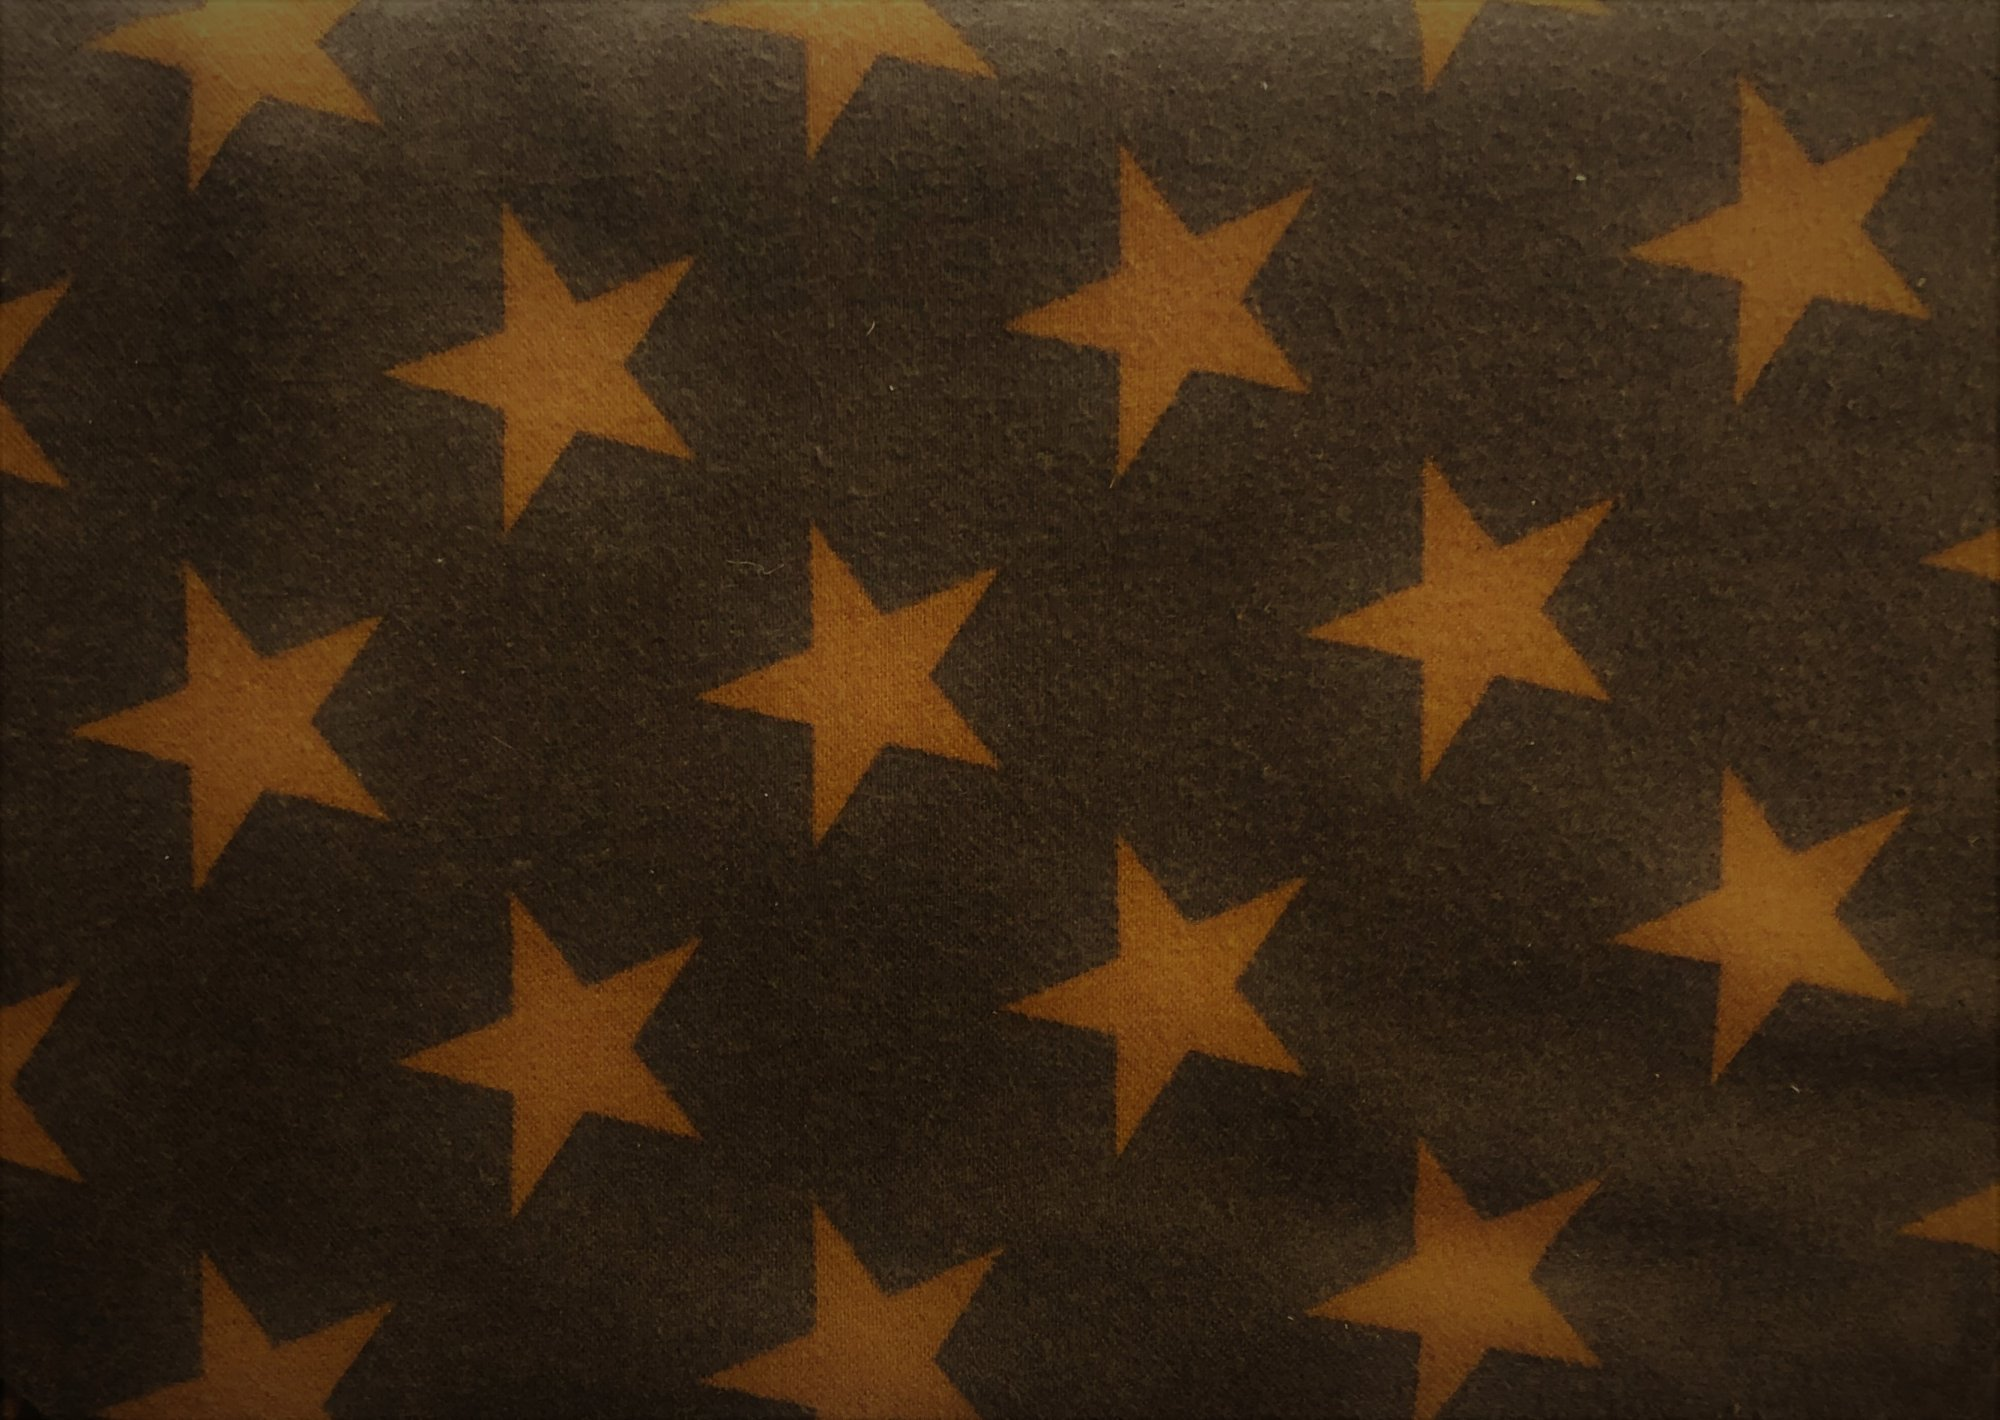 Andover Star Gazing Flannel F2879-VF '